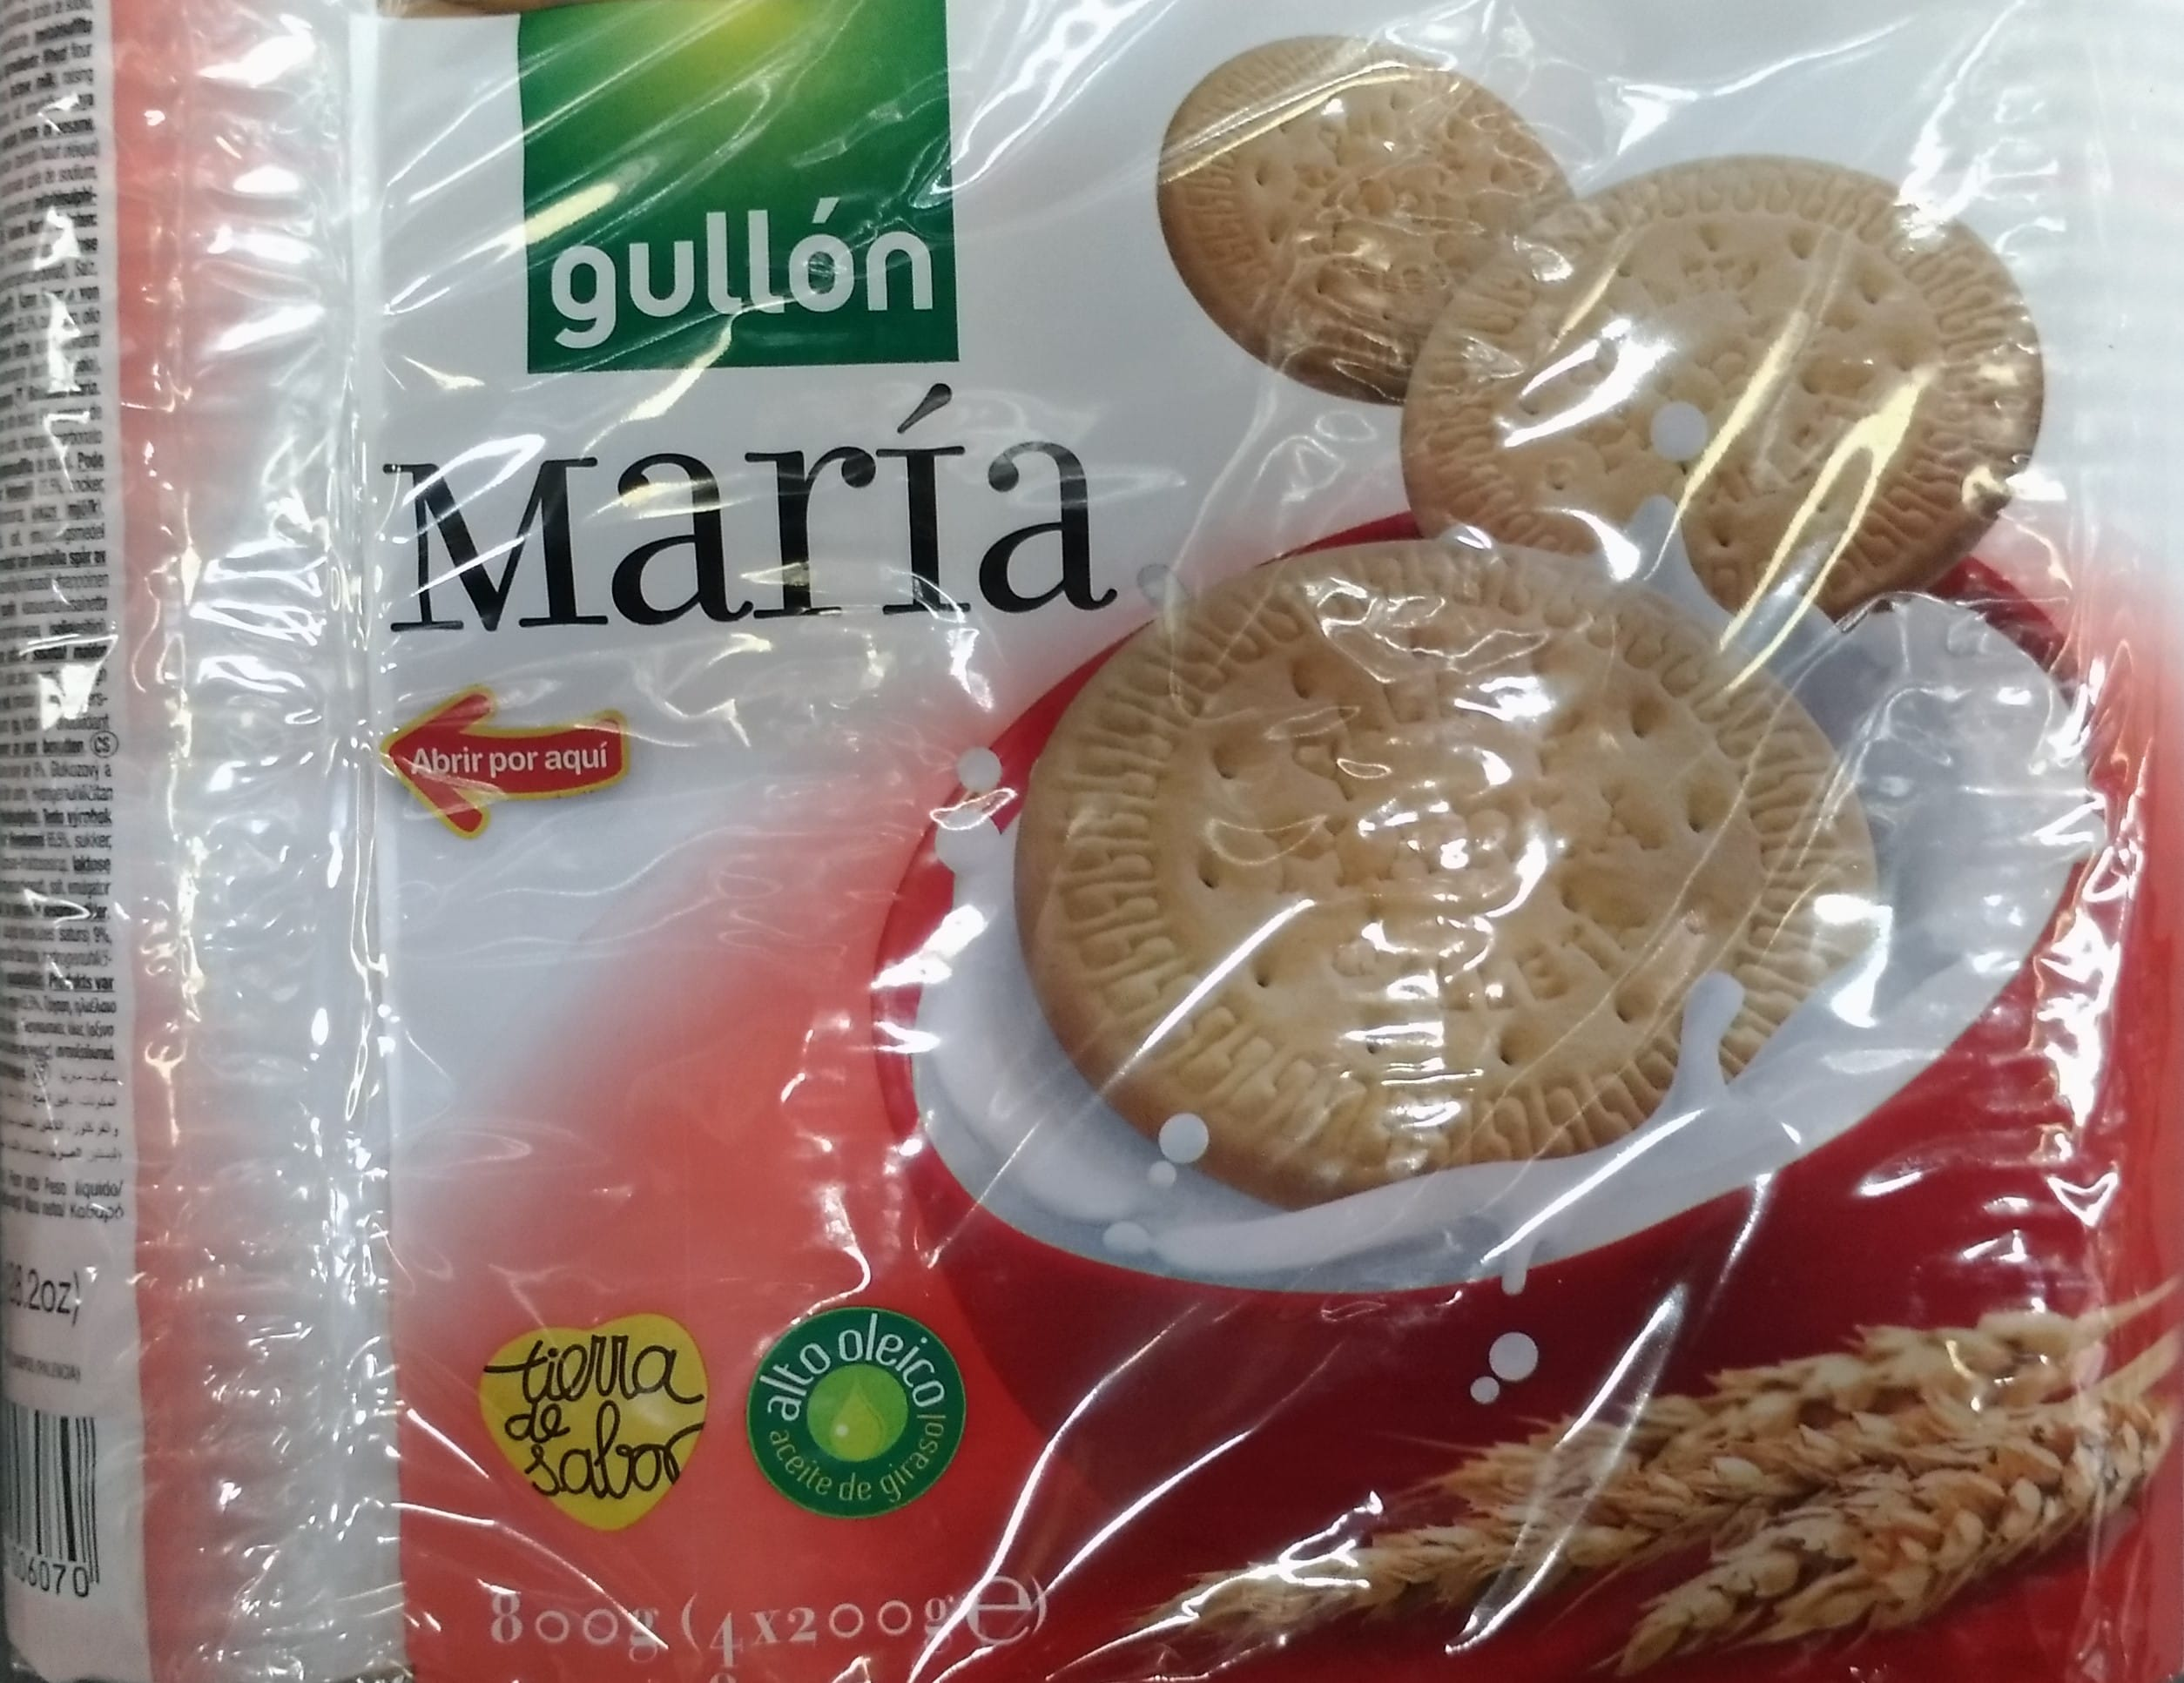 Galleta Gullon Maria 800g